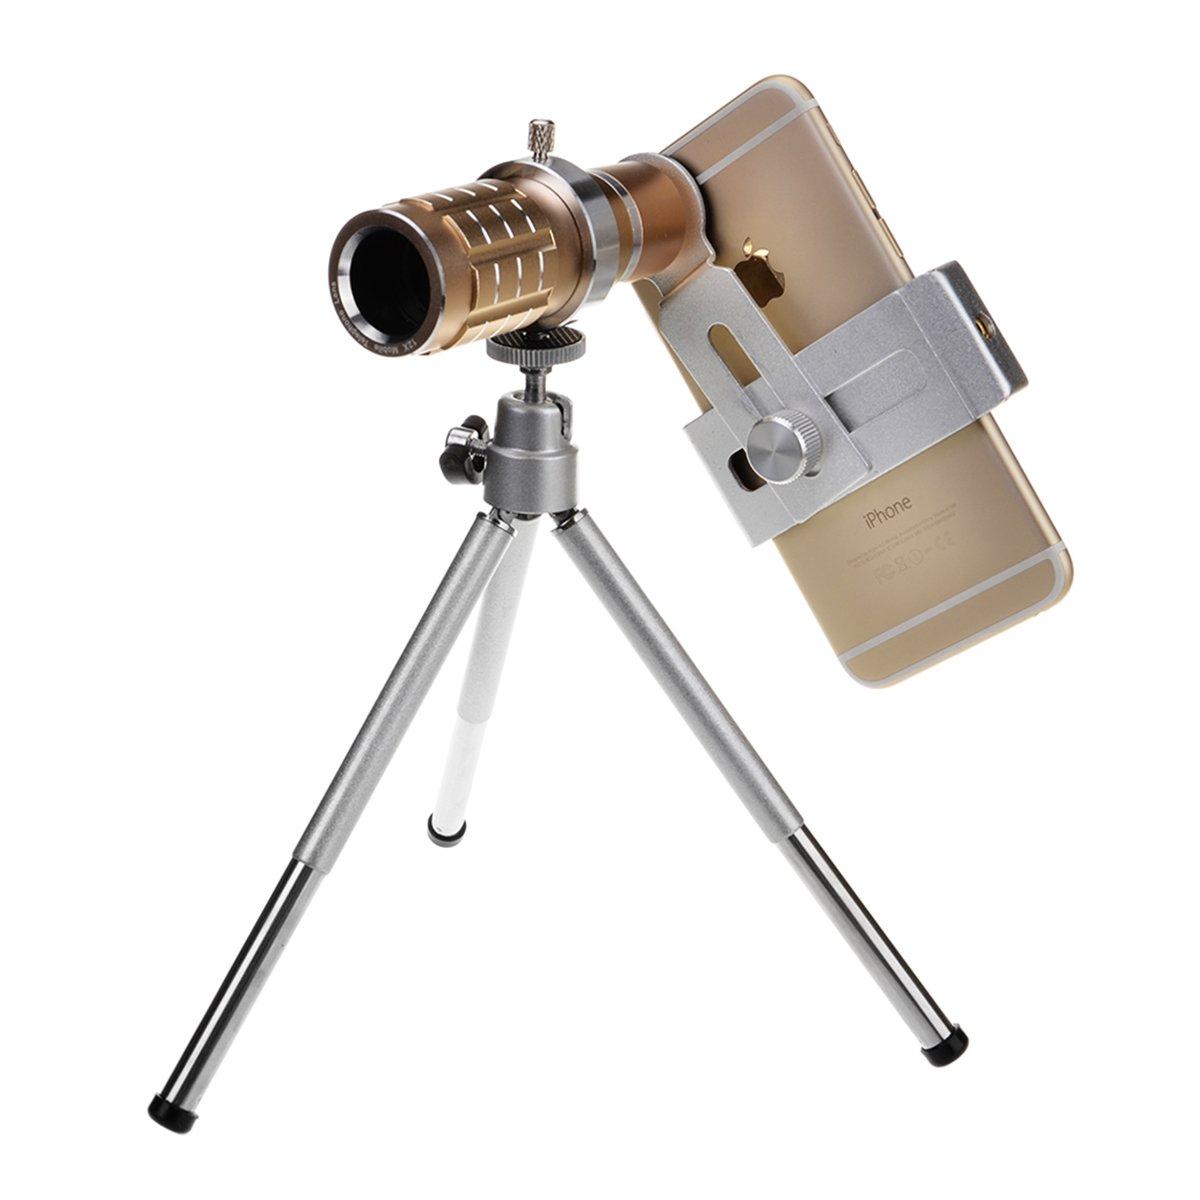 12X Universal Aluminum Optical Zoom with Mini Tripod Smartphone Metal Telescope Long Focus Lens -Glod